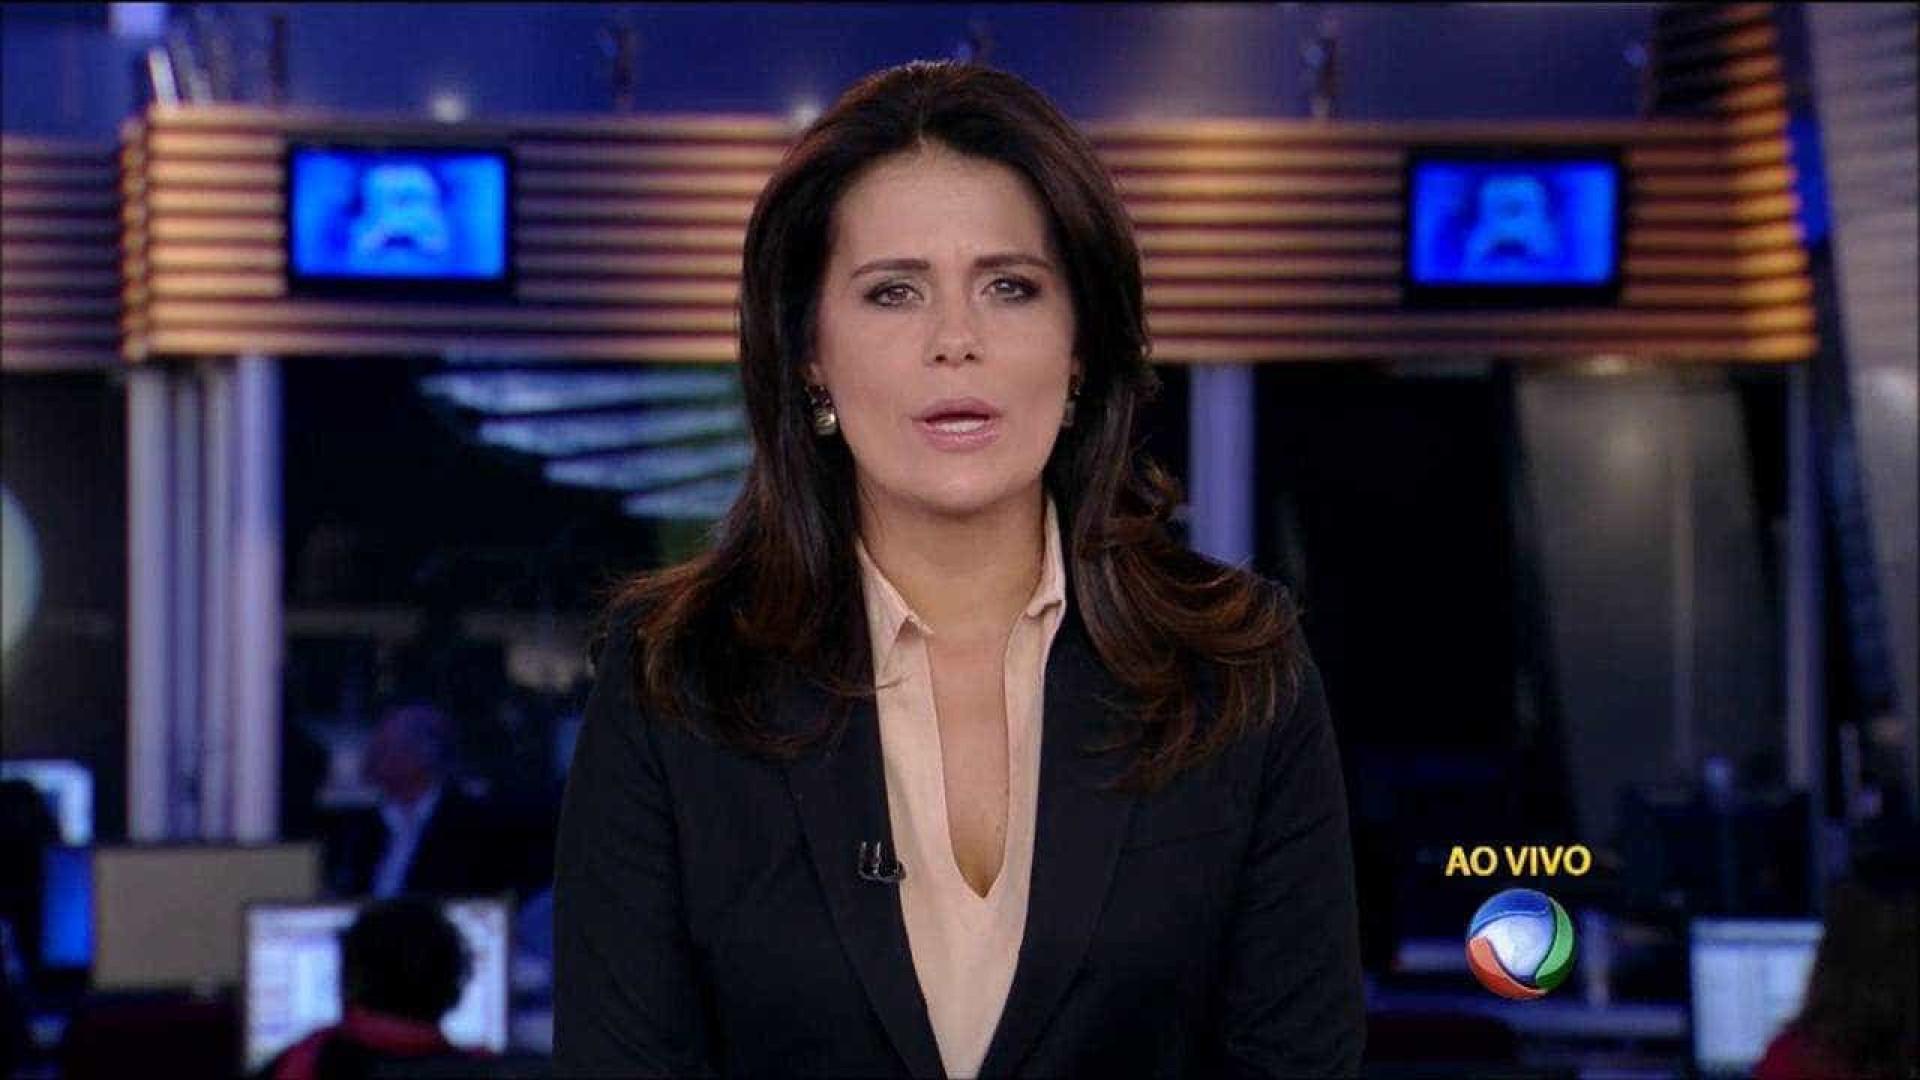 Jornalista da Record relata assédio sexual que sofreu no Congresso